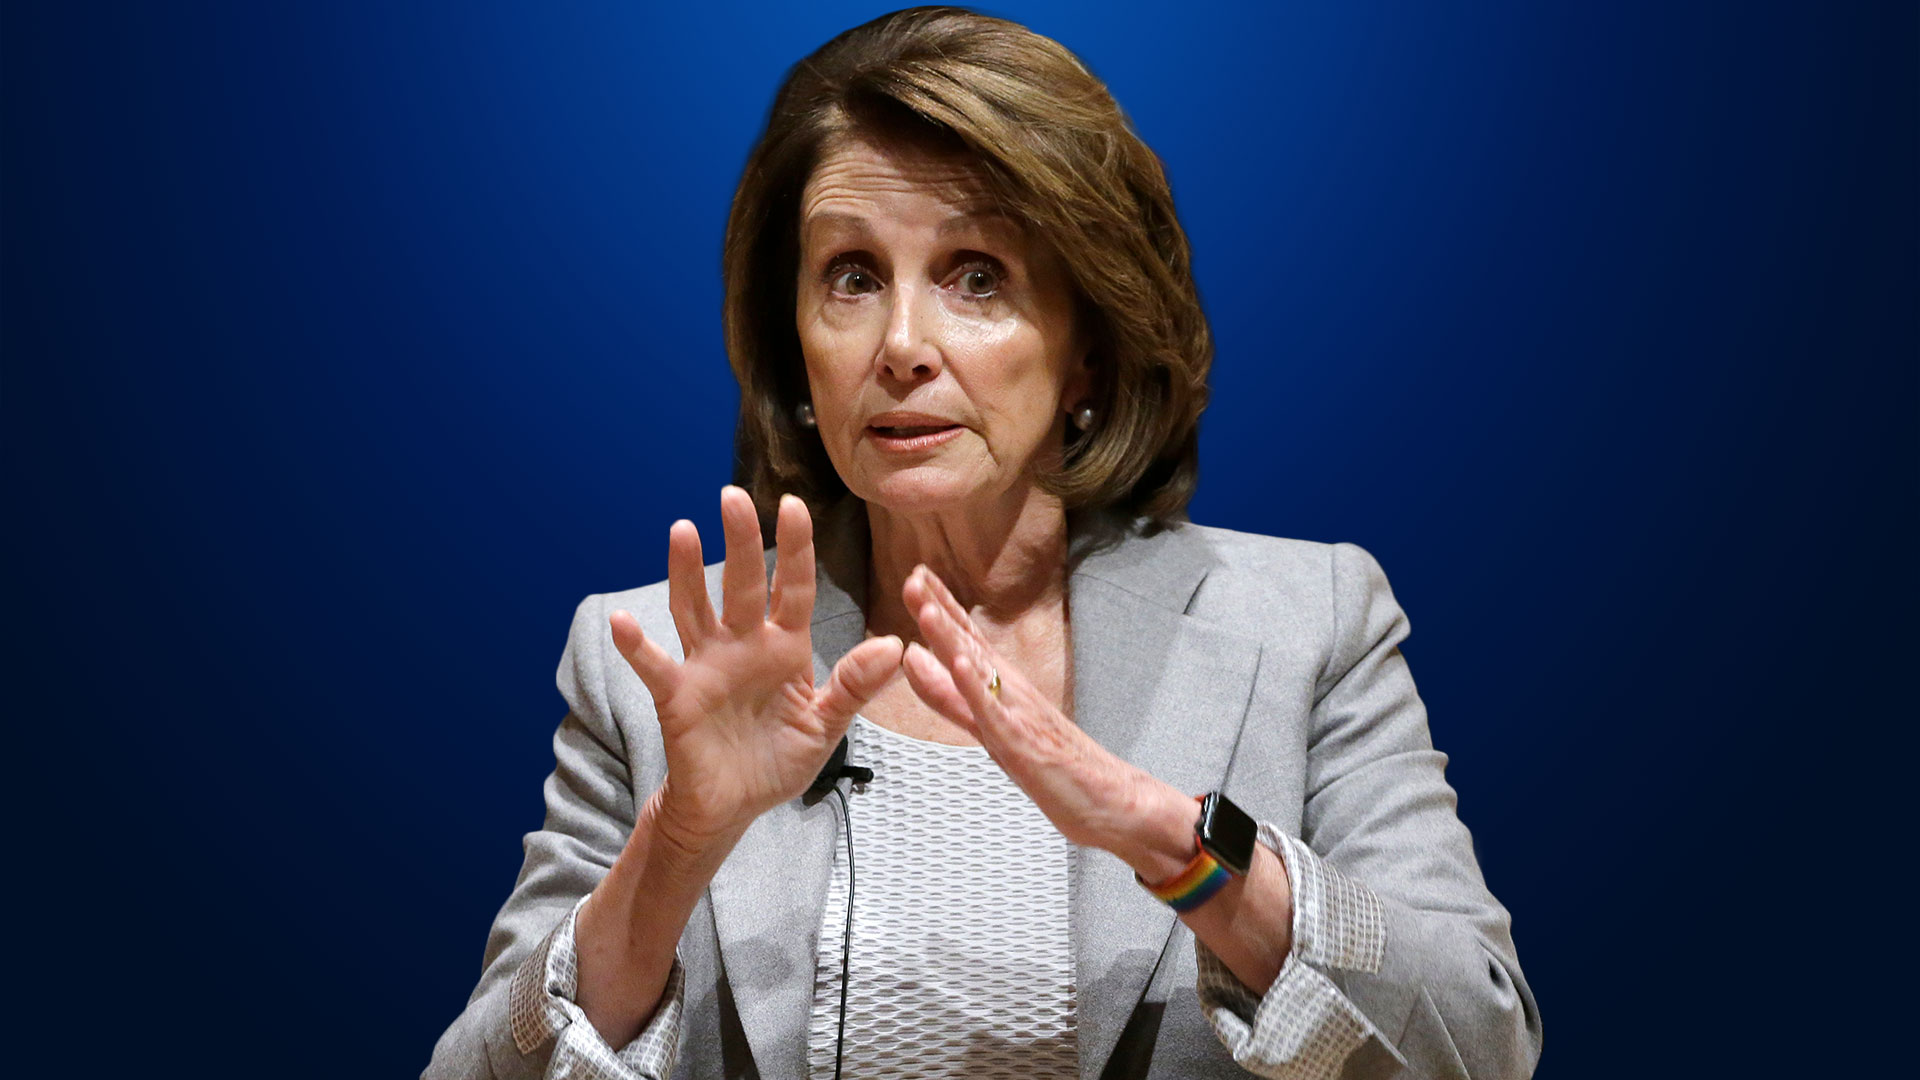 KELO Nancy Pelosi